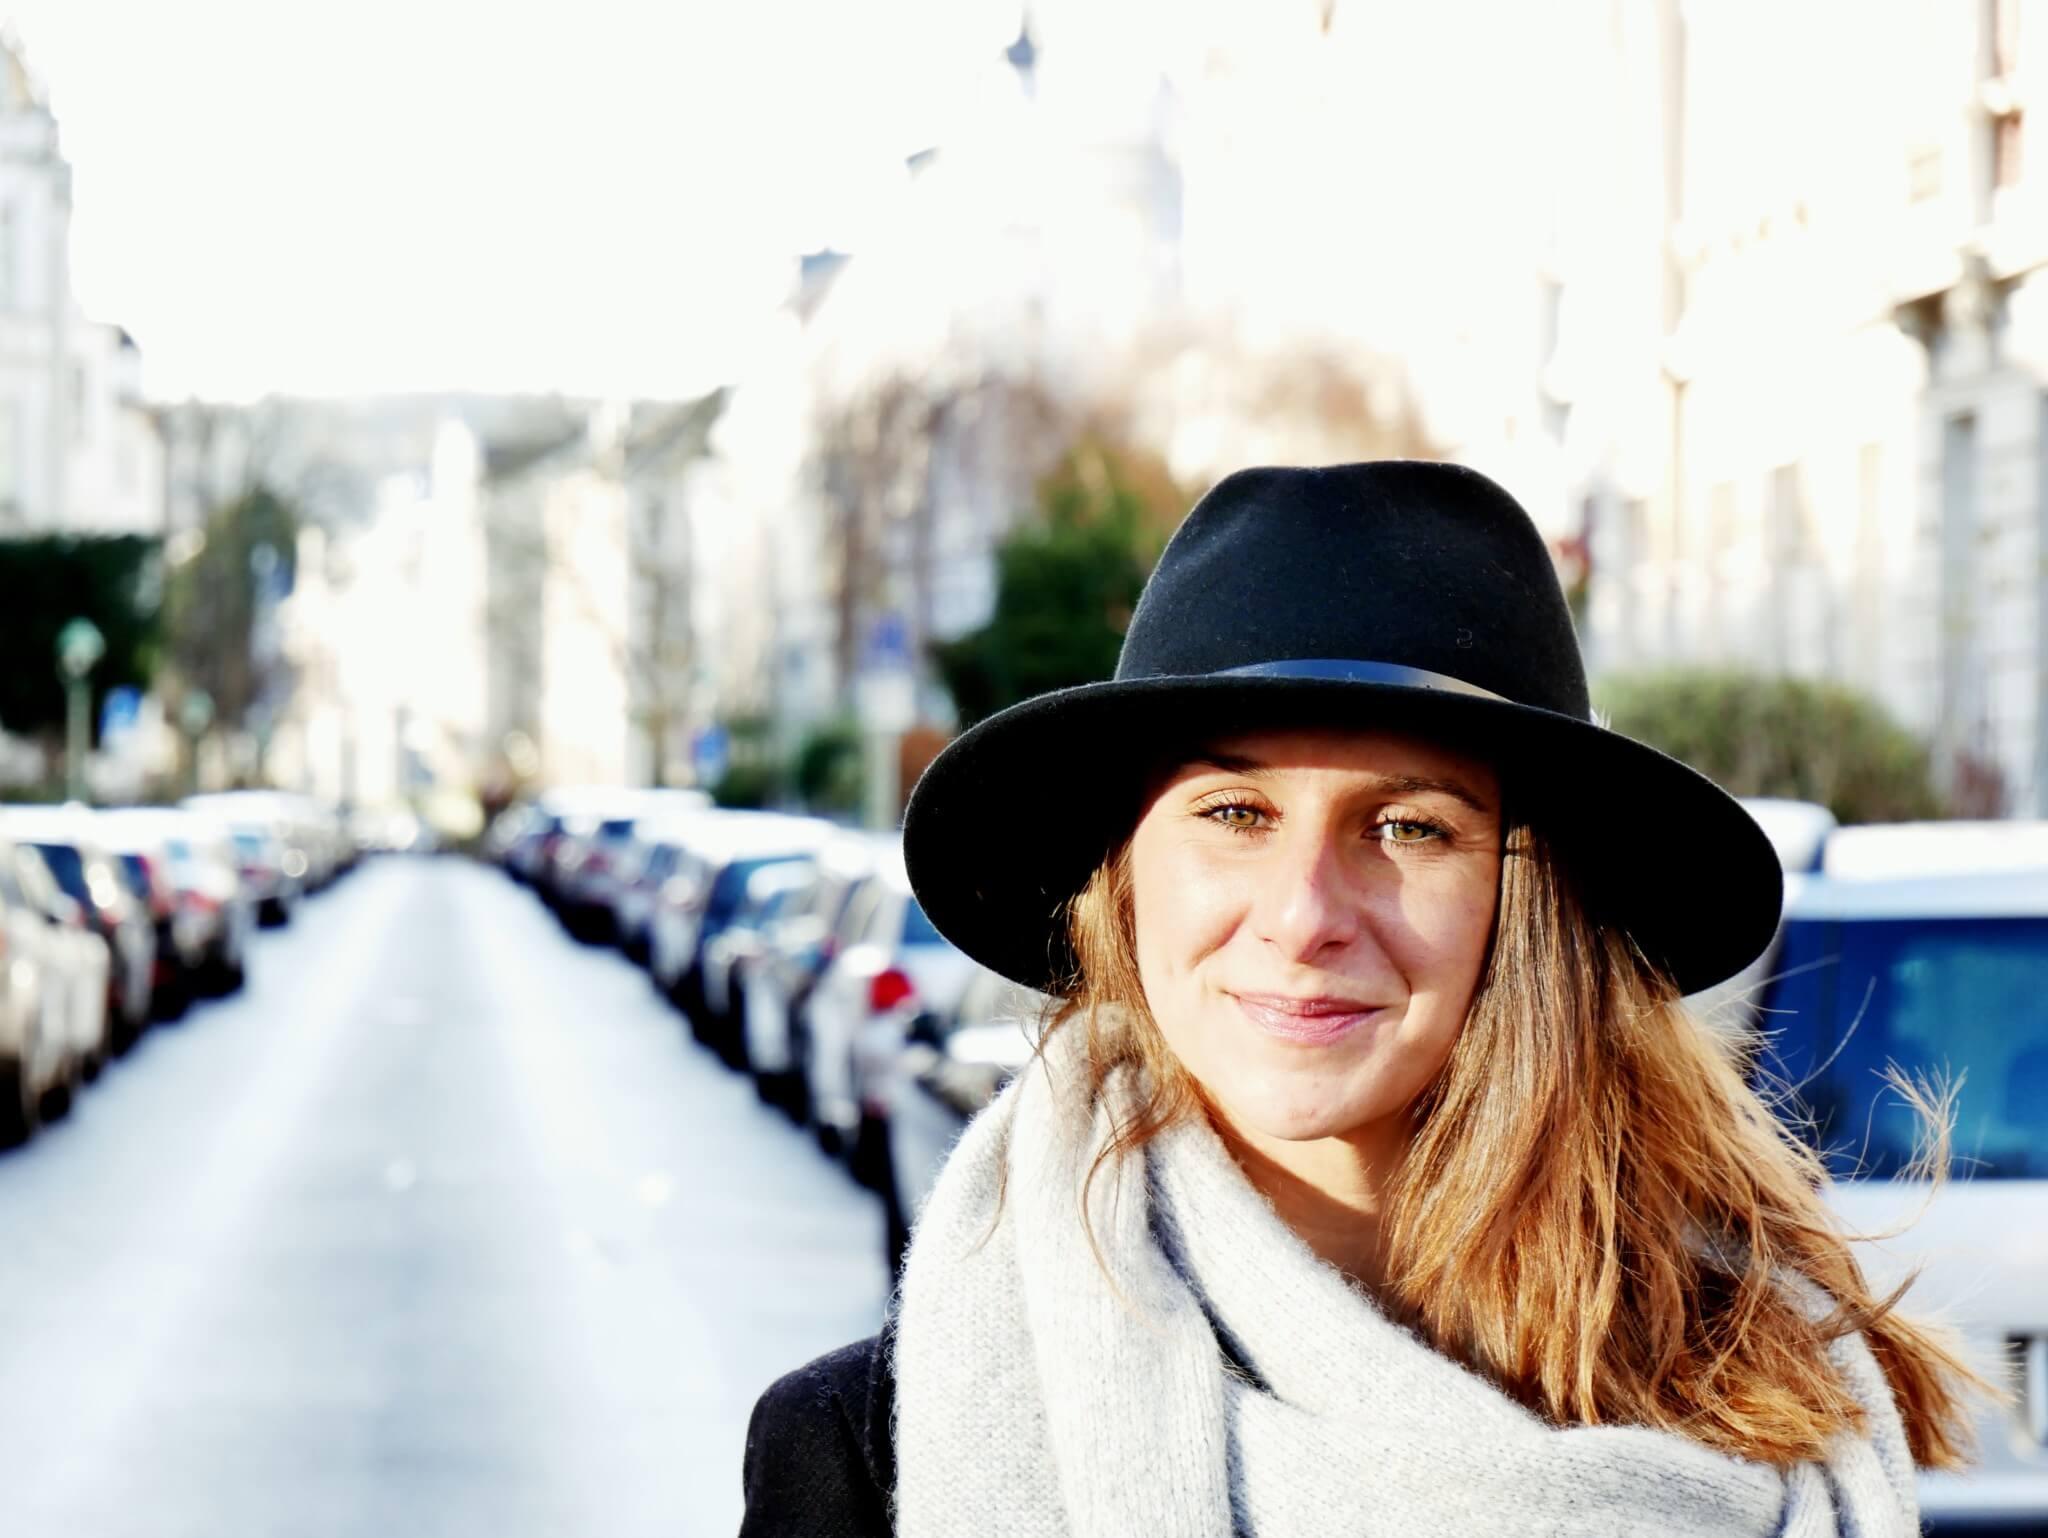 Laura Seiler